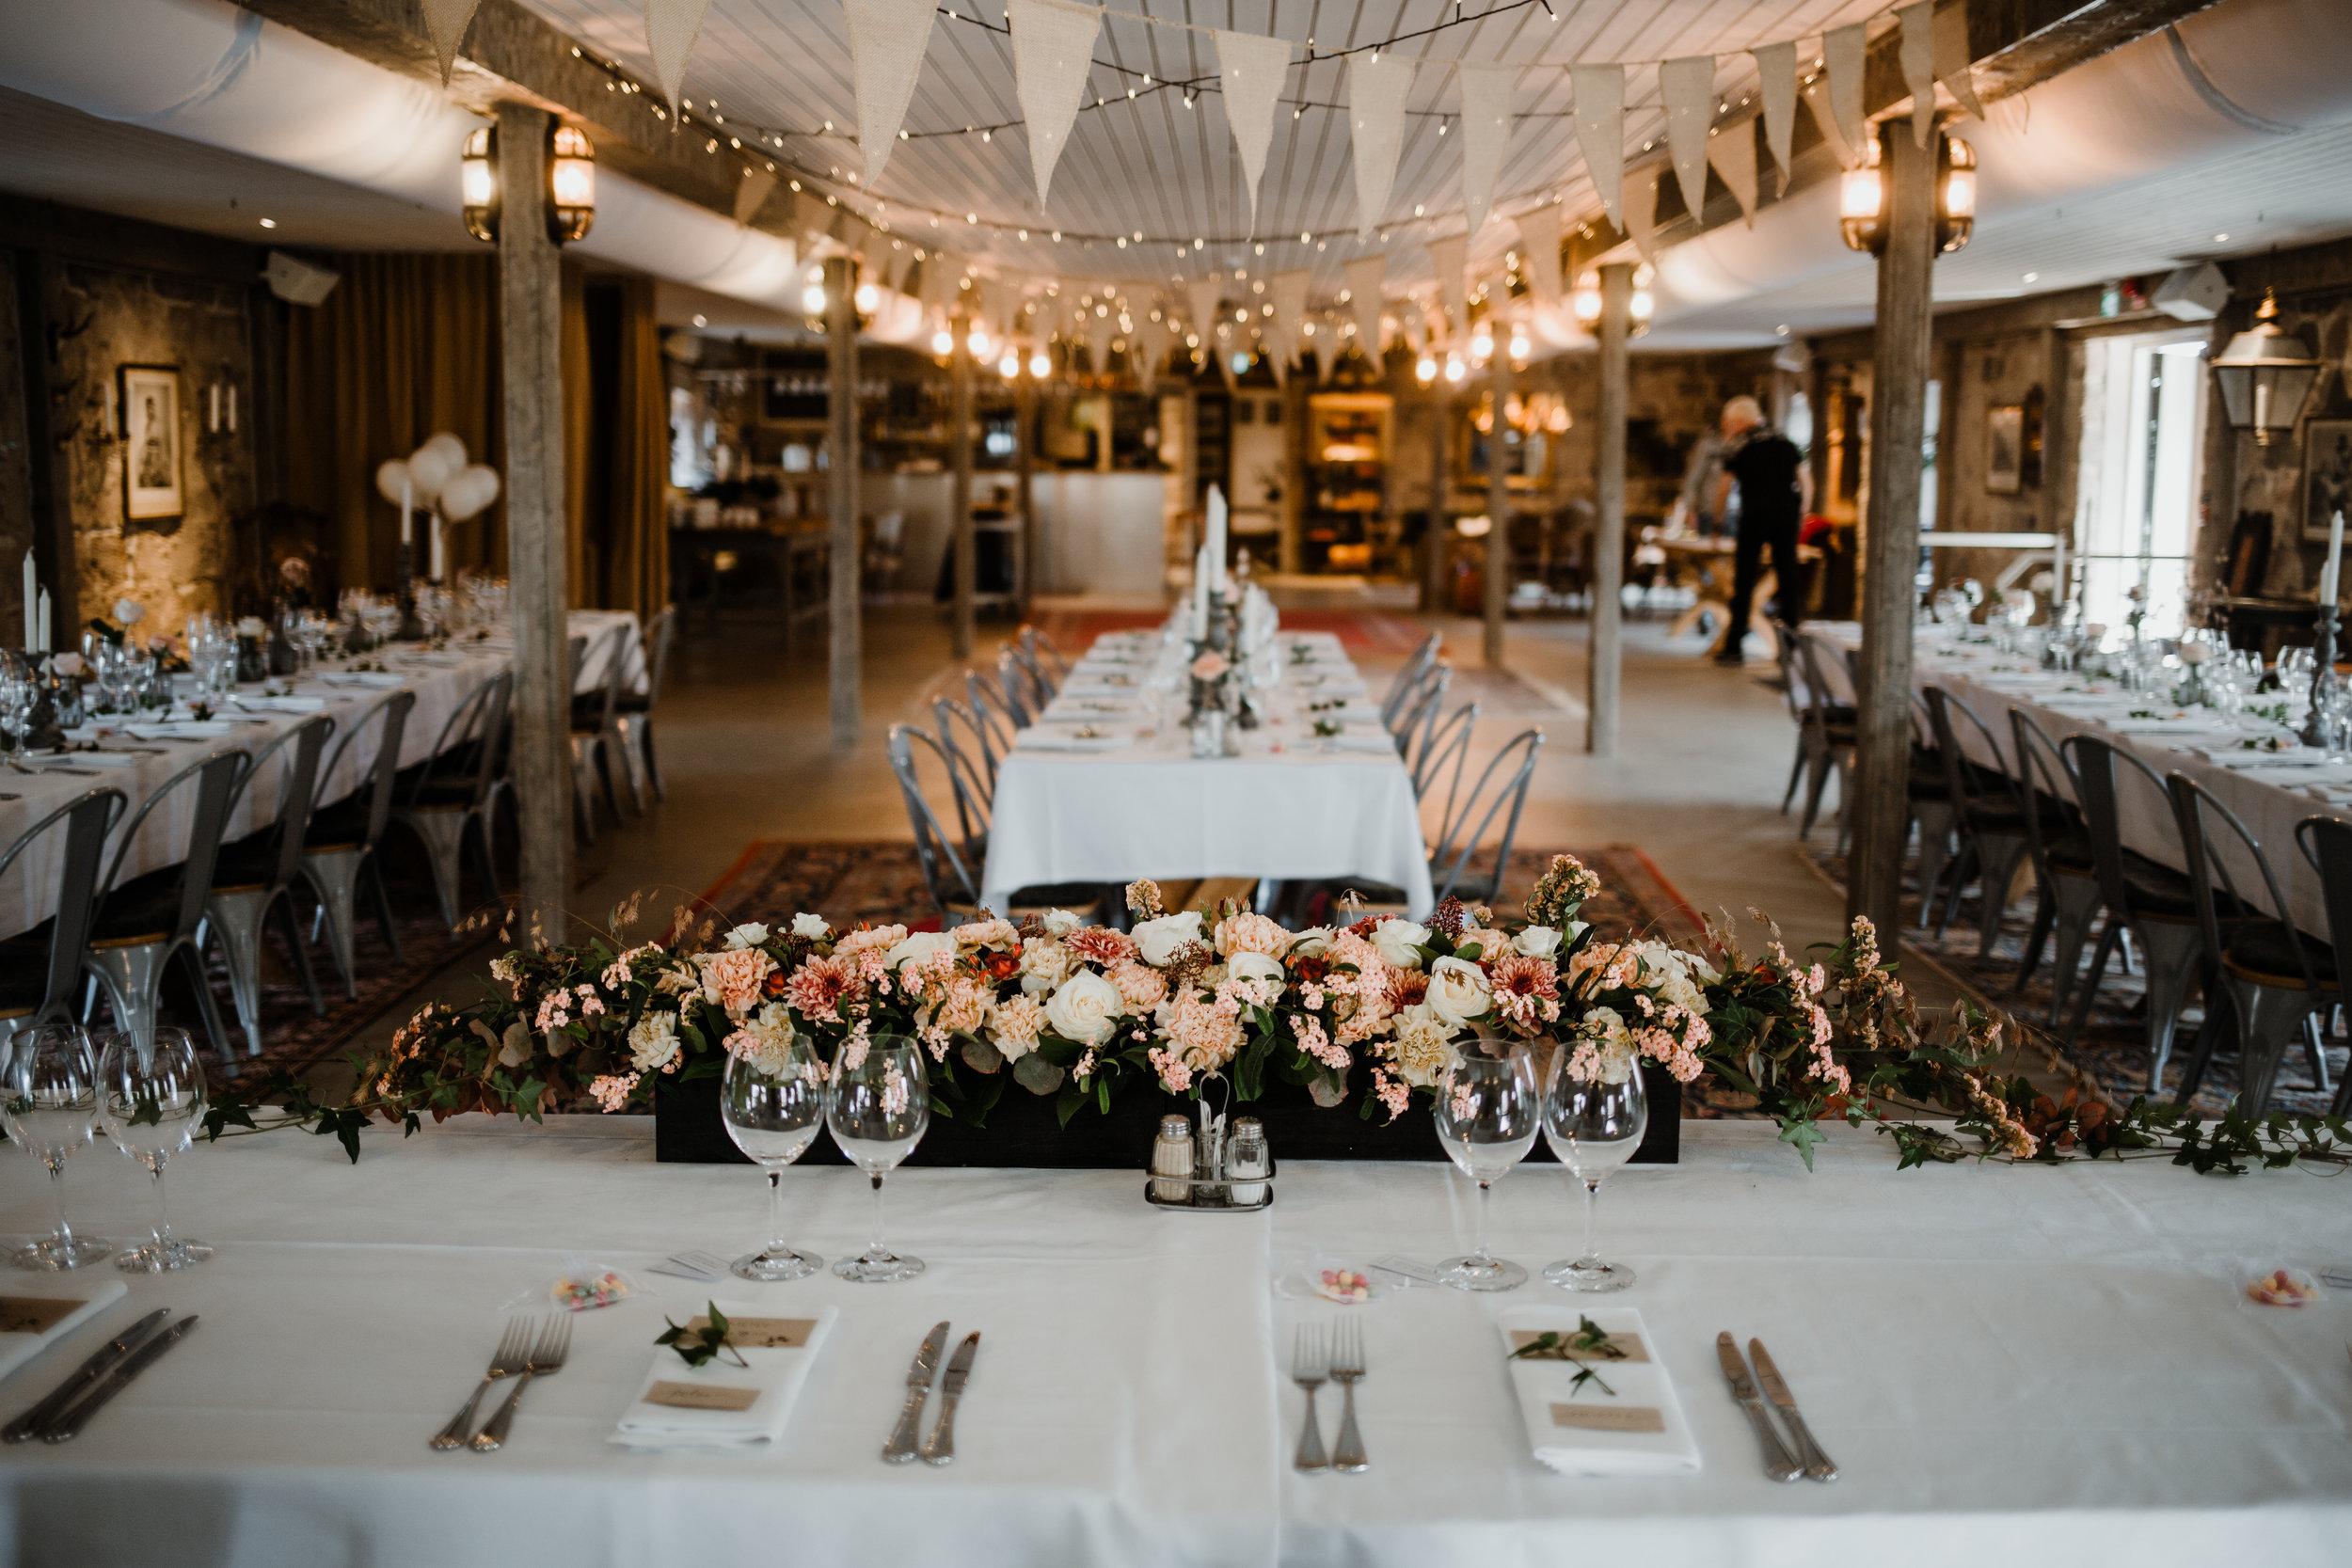 Bröllopsfotograf-Uddetorp Säteri-Höstbröllop-Fotograf Emilia- Bröllopsfotograf Borås-29.jpg